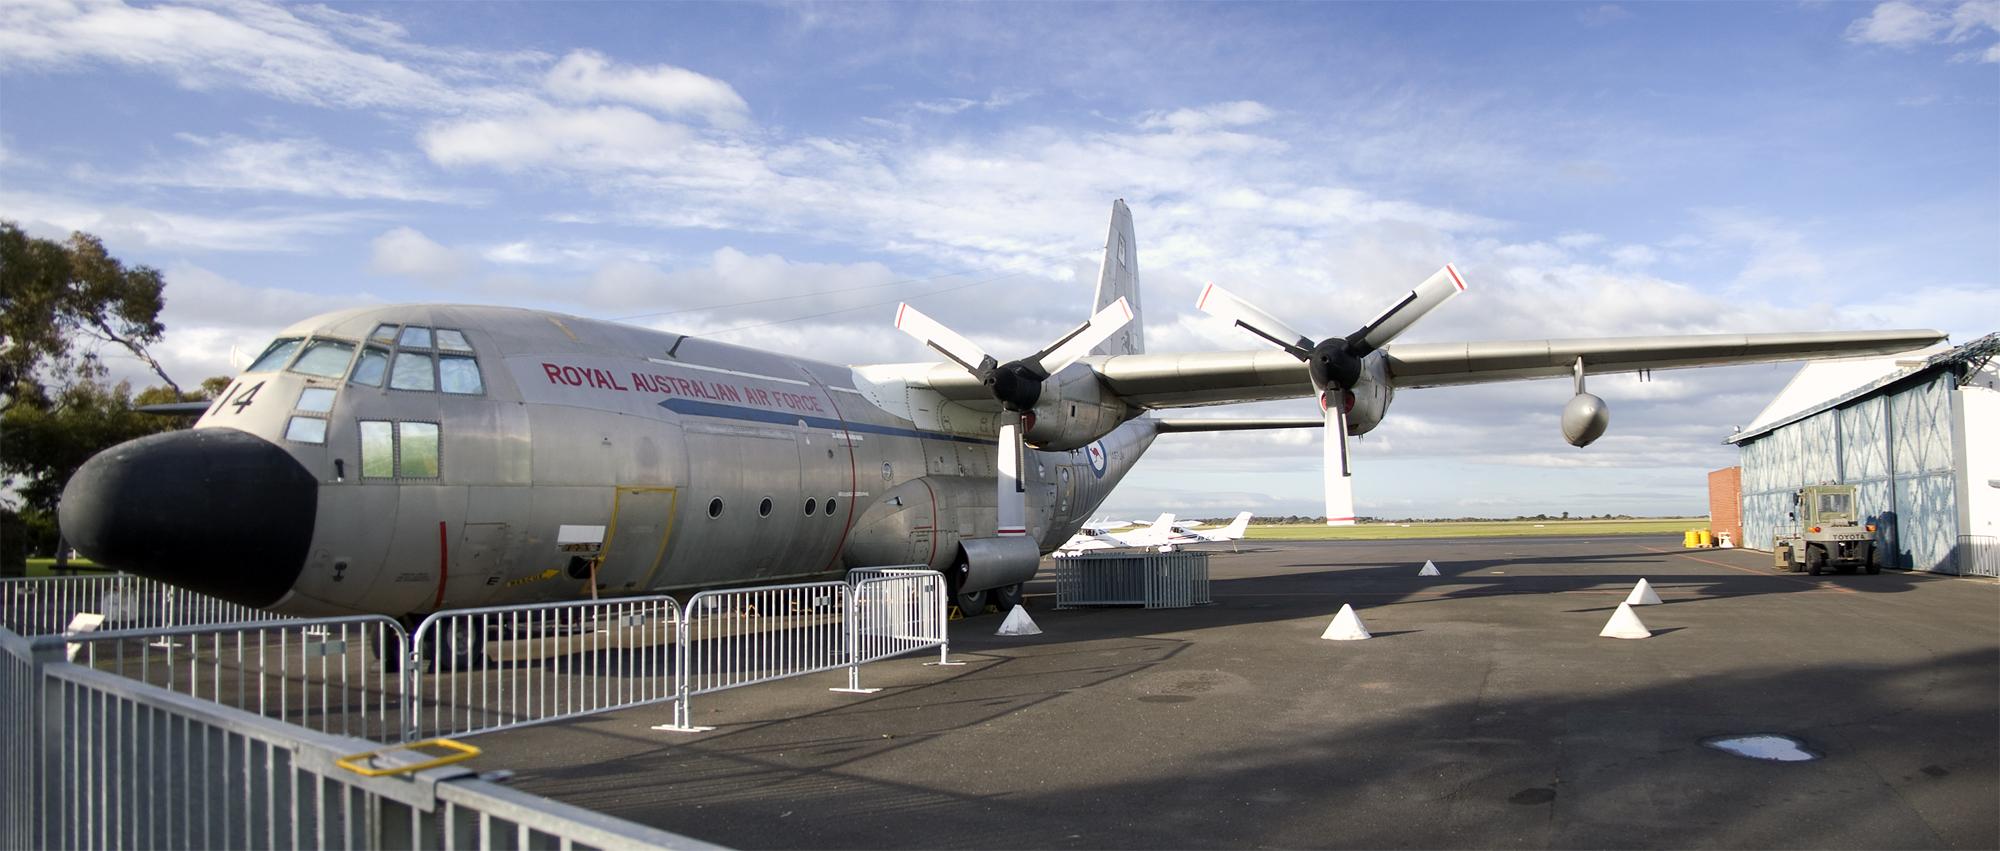 Description Lockheed C-130A Hercules (A97-214) at the RAAF Museum.jpg